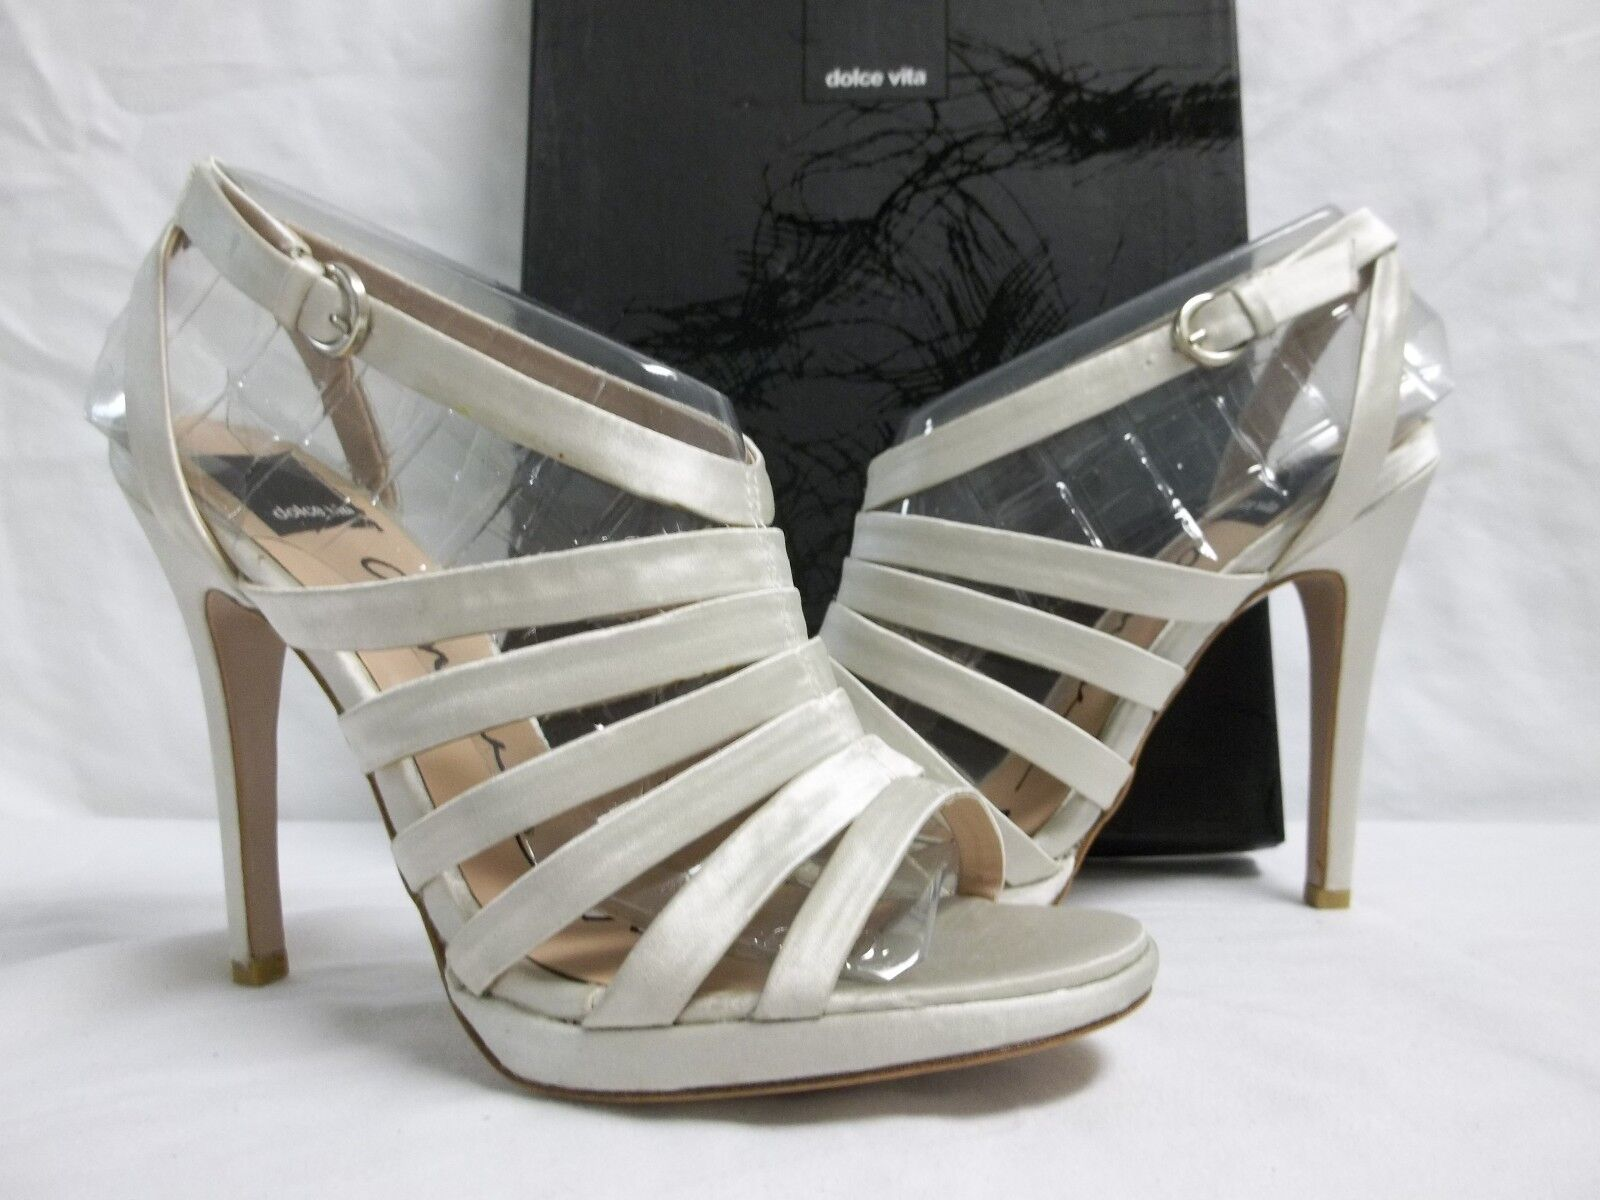 Dolce Vita Größe 9.5 M Riso Ivory Satin Open Toe Heels NEU Damenschuhe Schuhes